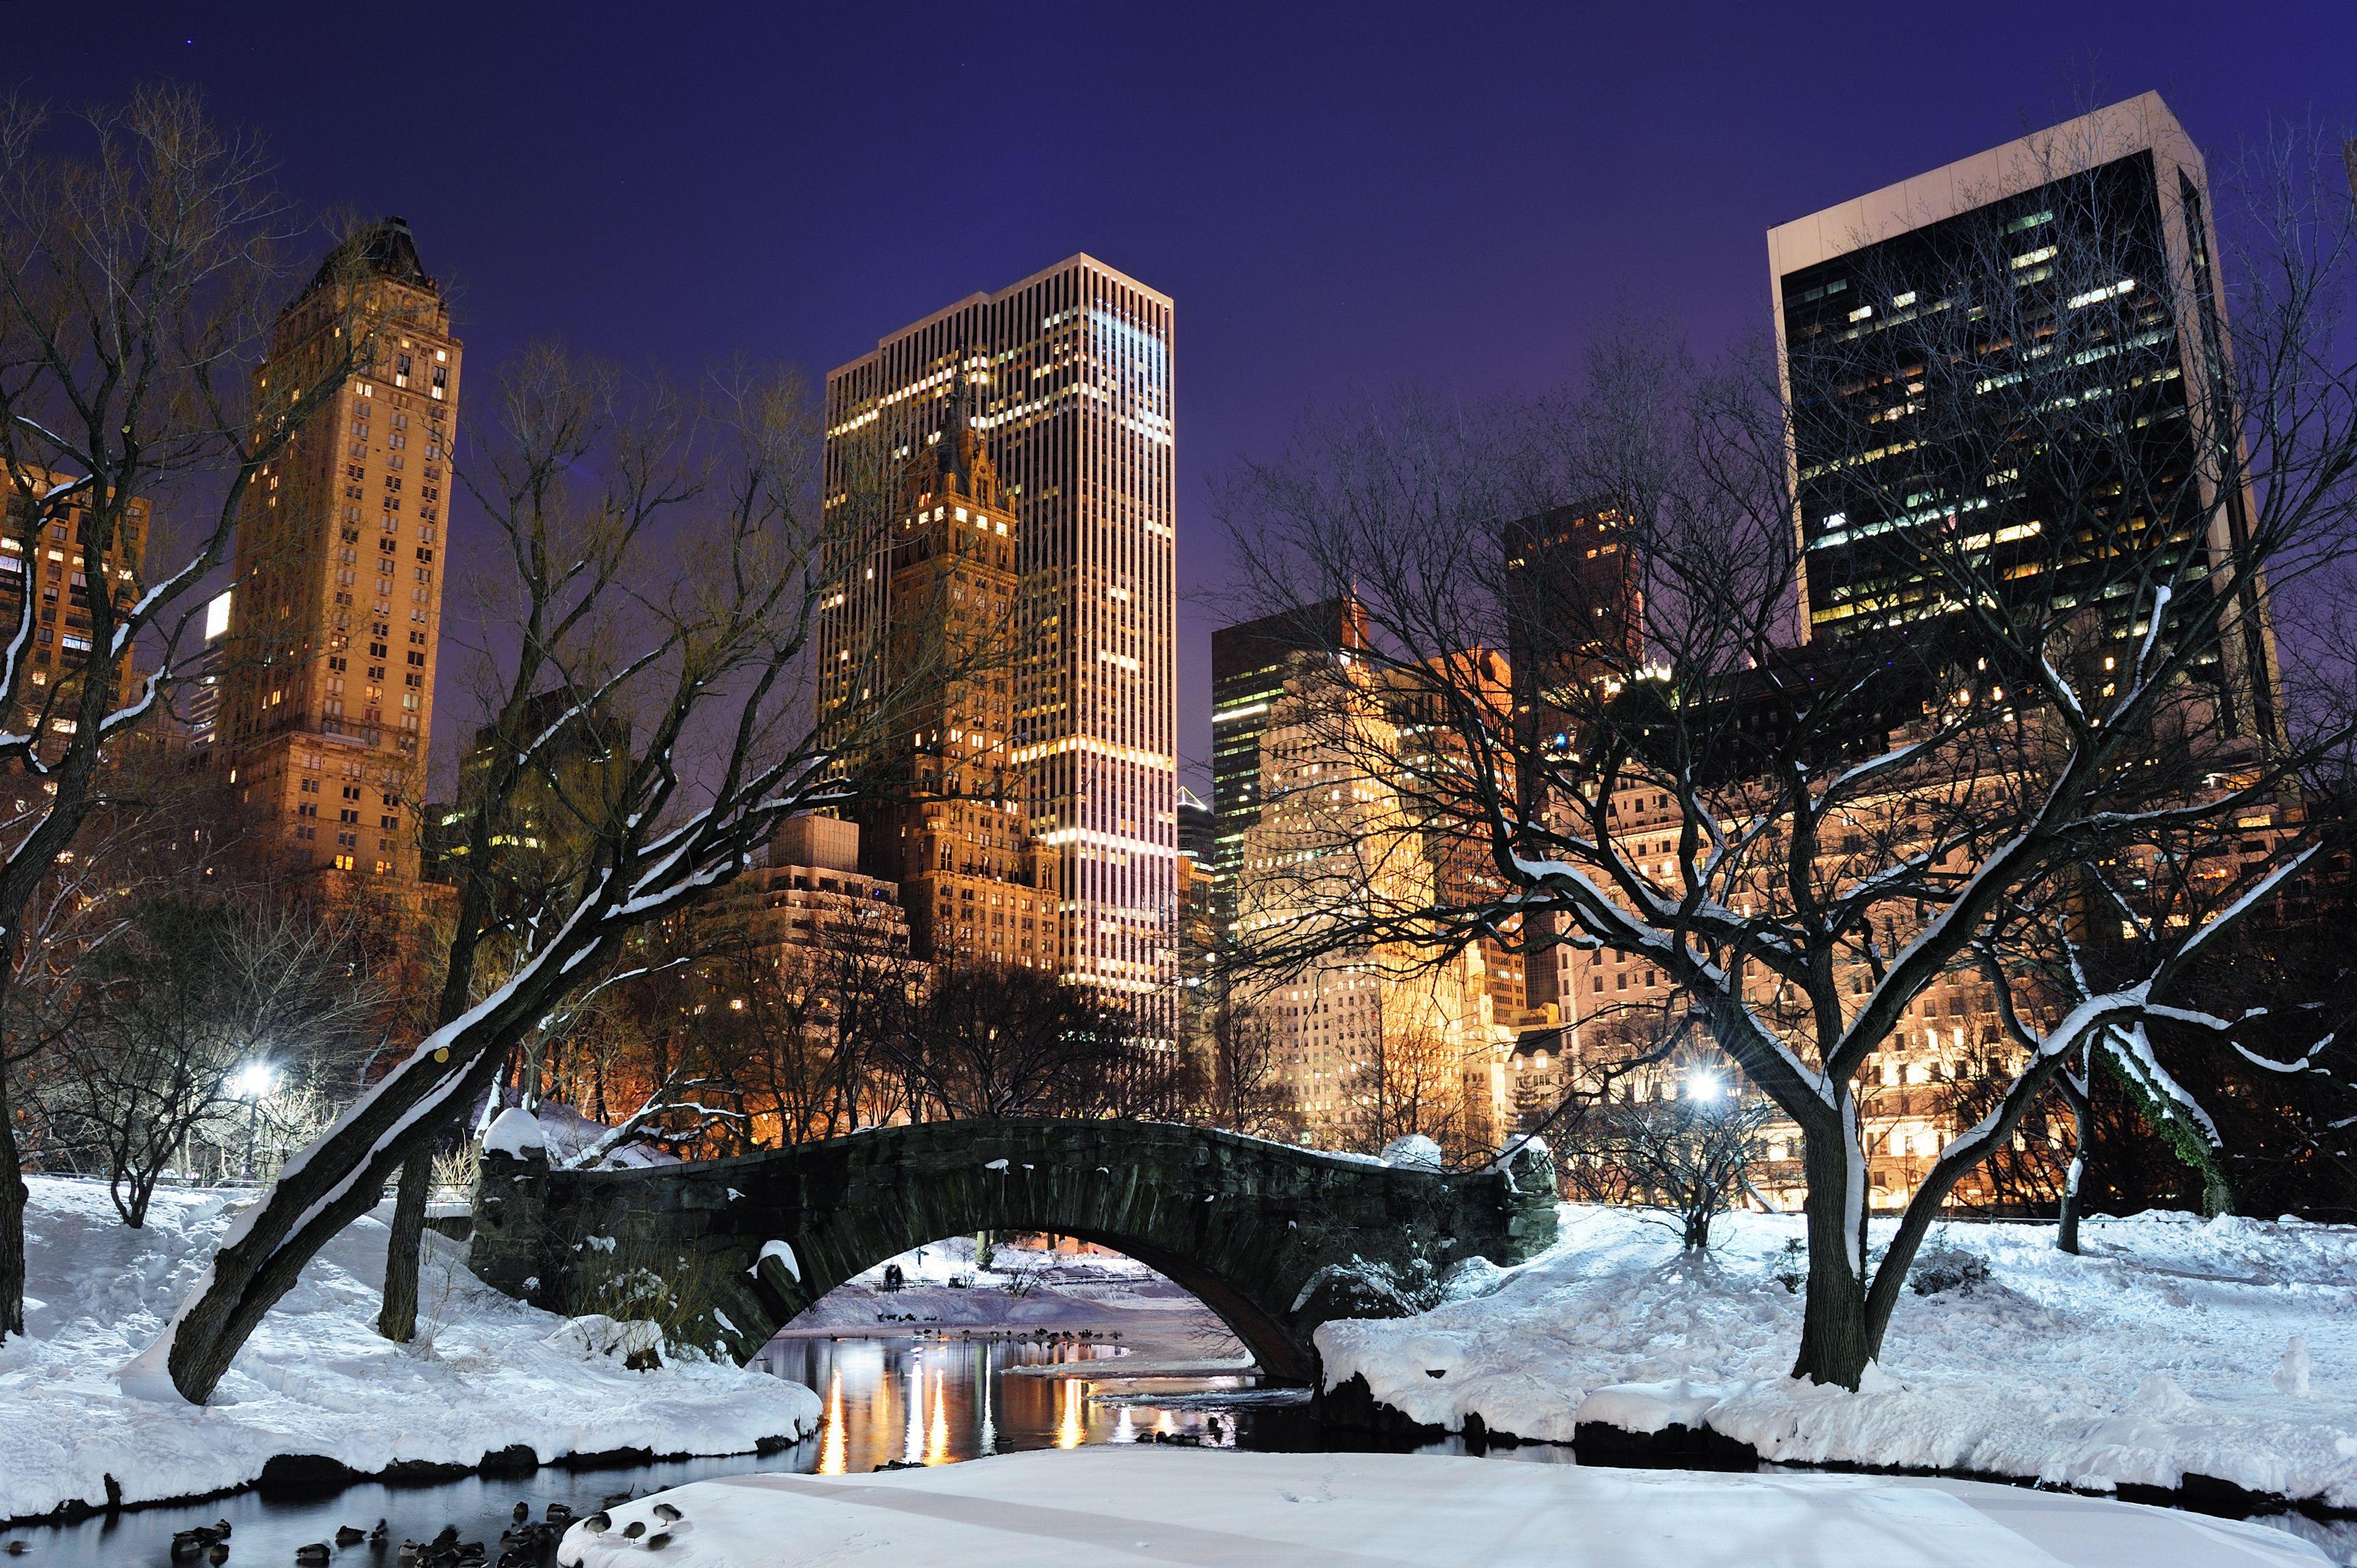 New York Winter Night Desktop Wallpaper Hd 3440x2289px Endroits 3440x2289